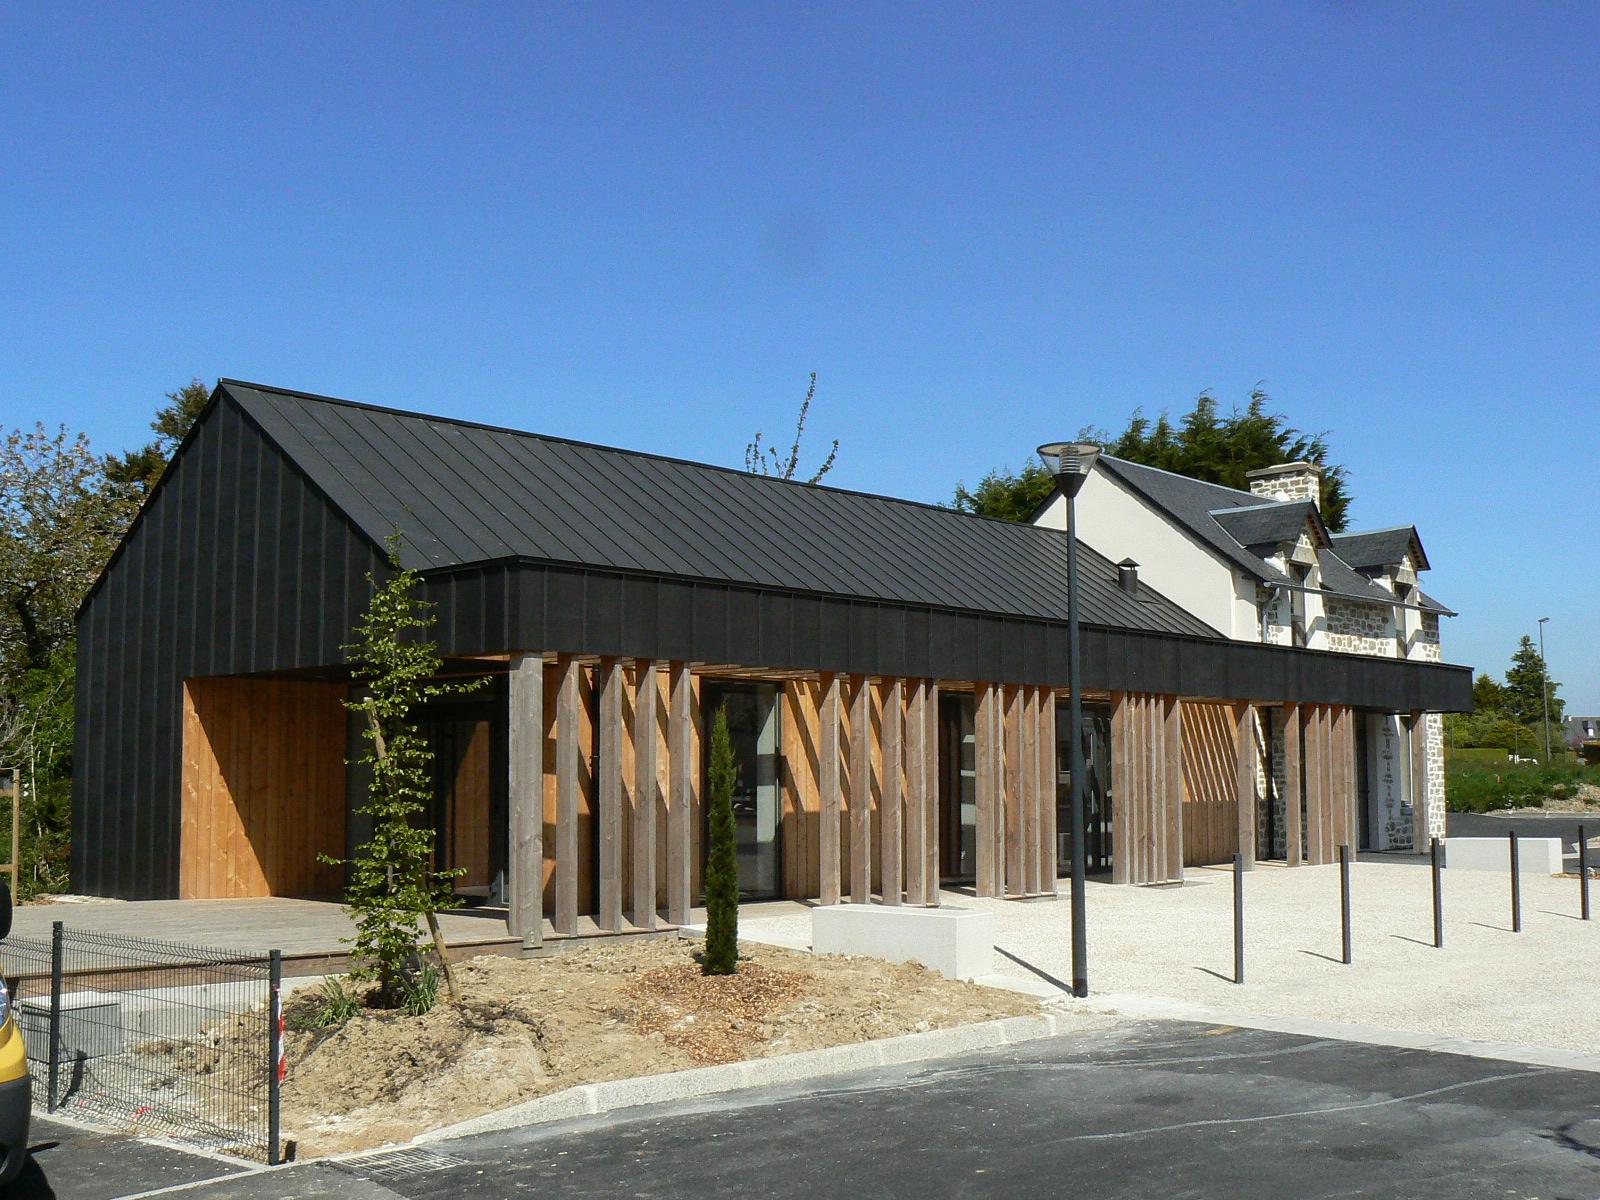 Salle des associations, Languenan